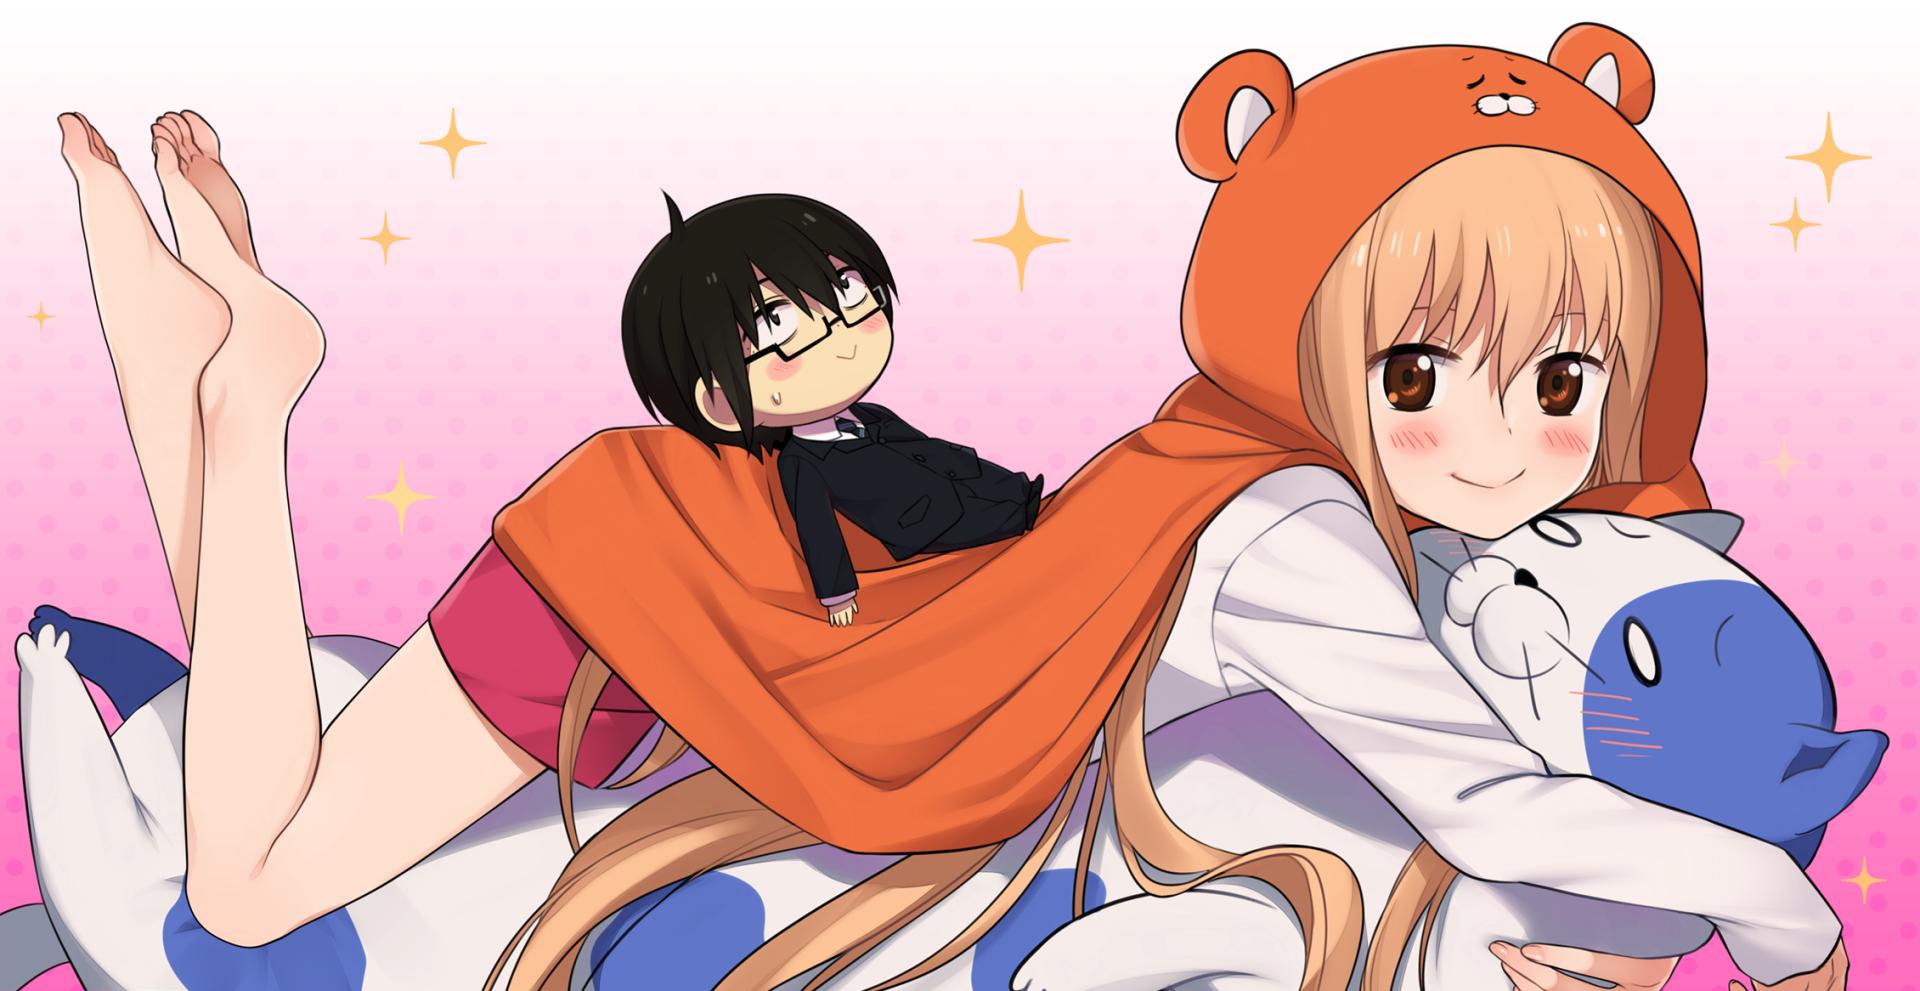 Anime - Himouto! Umaru-chan  Umaru Doma Chibi Long Hair Taihei Doma Anime Blonde Smile Wallpaper